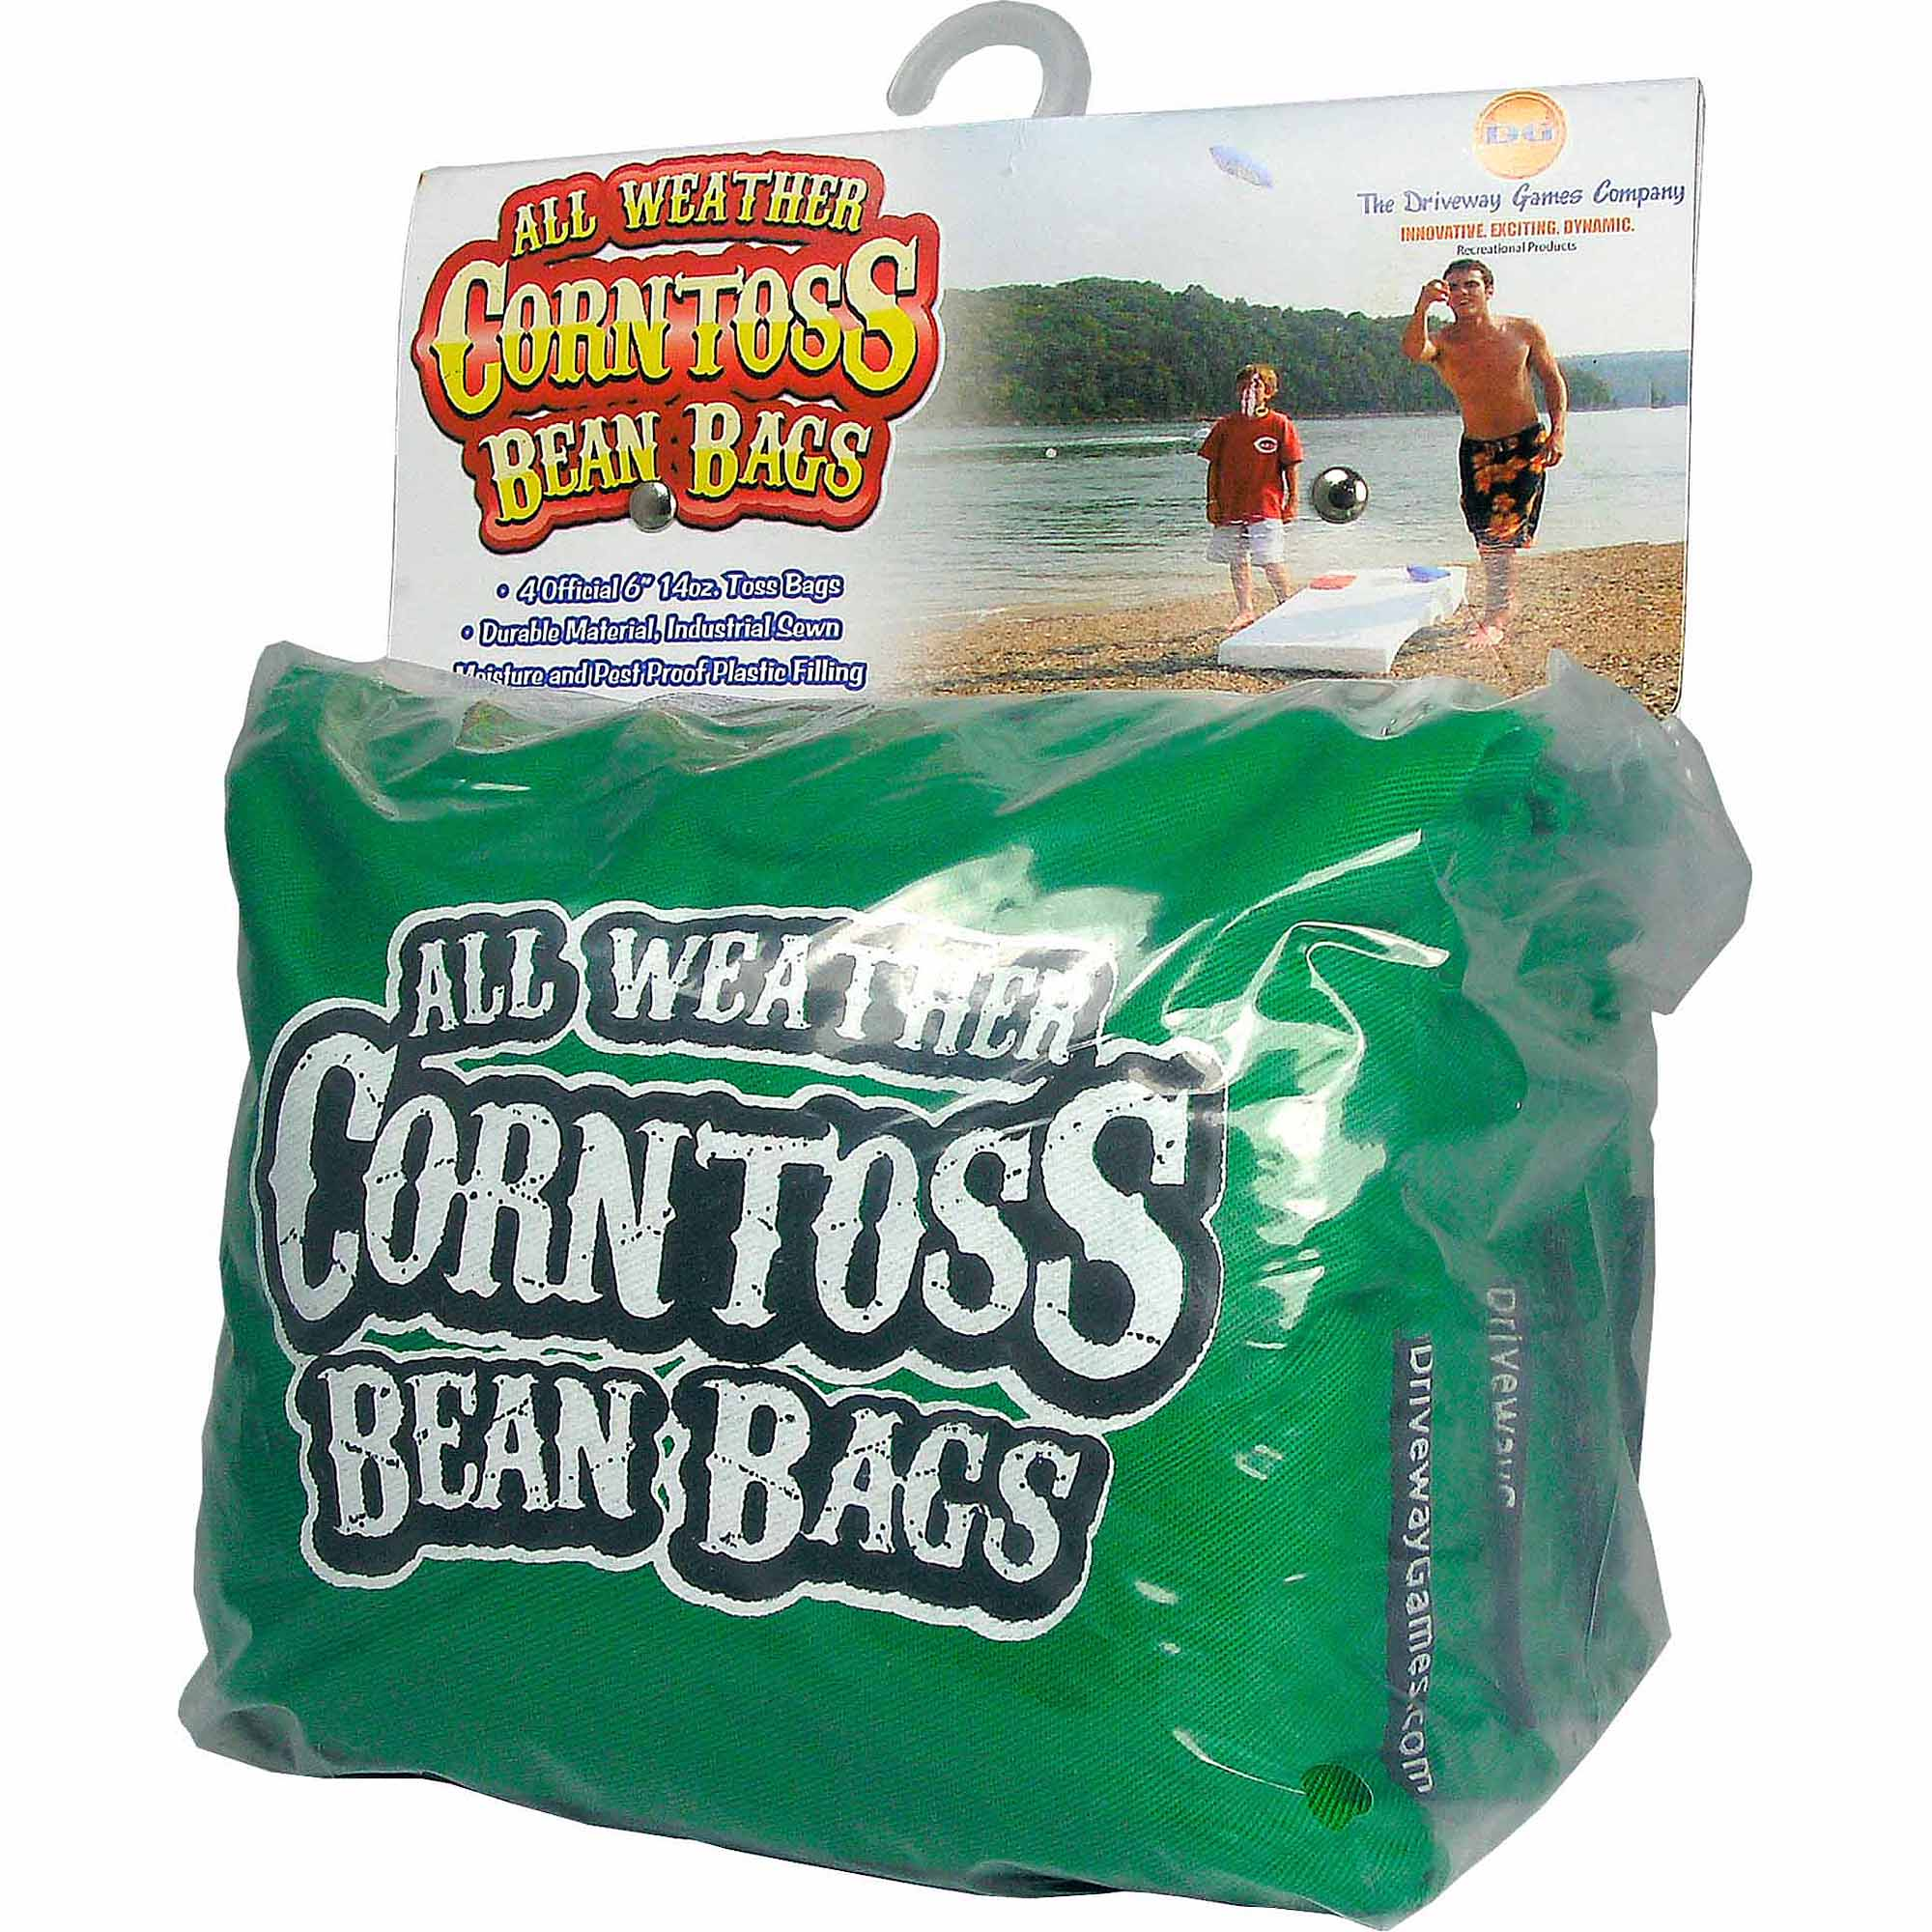 Driveway Games All Weather Corntoss Bean Bags, Green